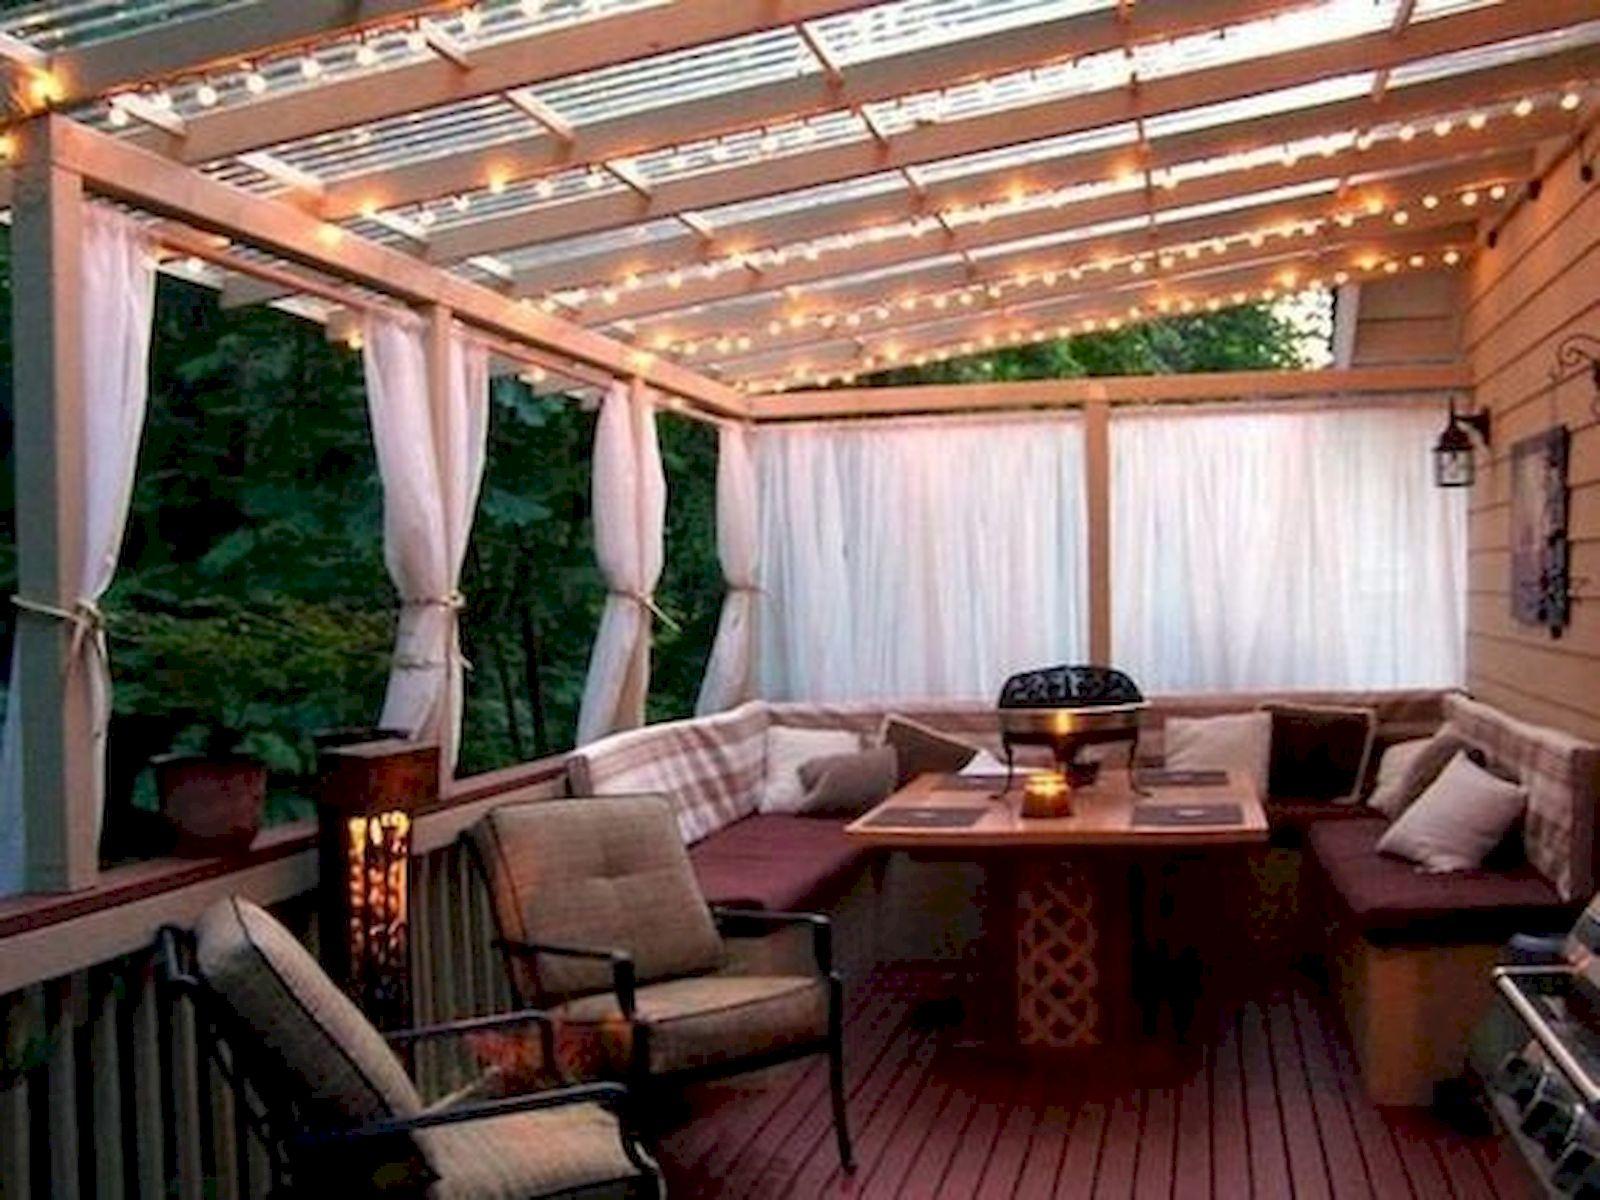 50 Best DIY Backyard Patio and Decking Design Ideas (22)